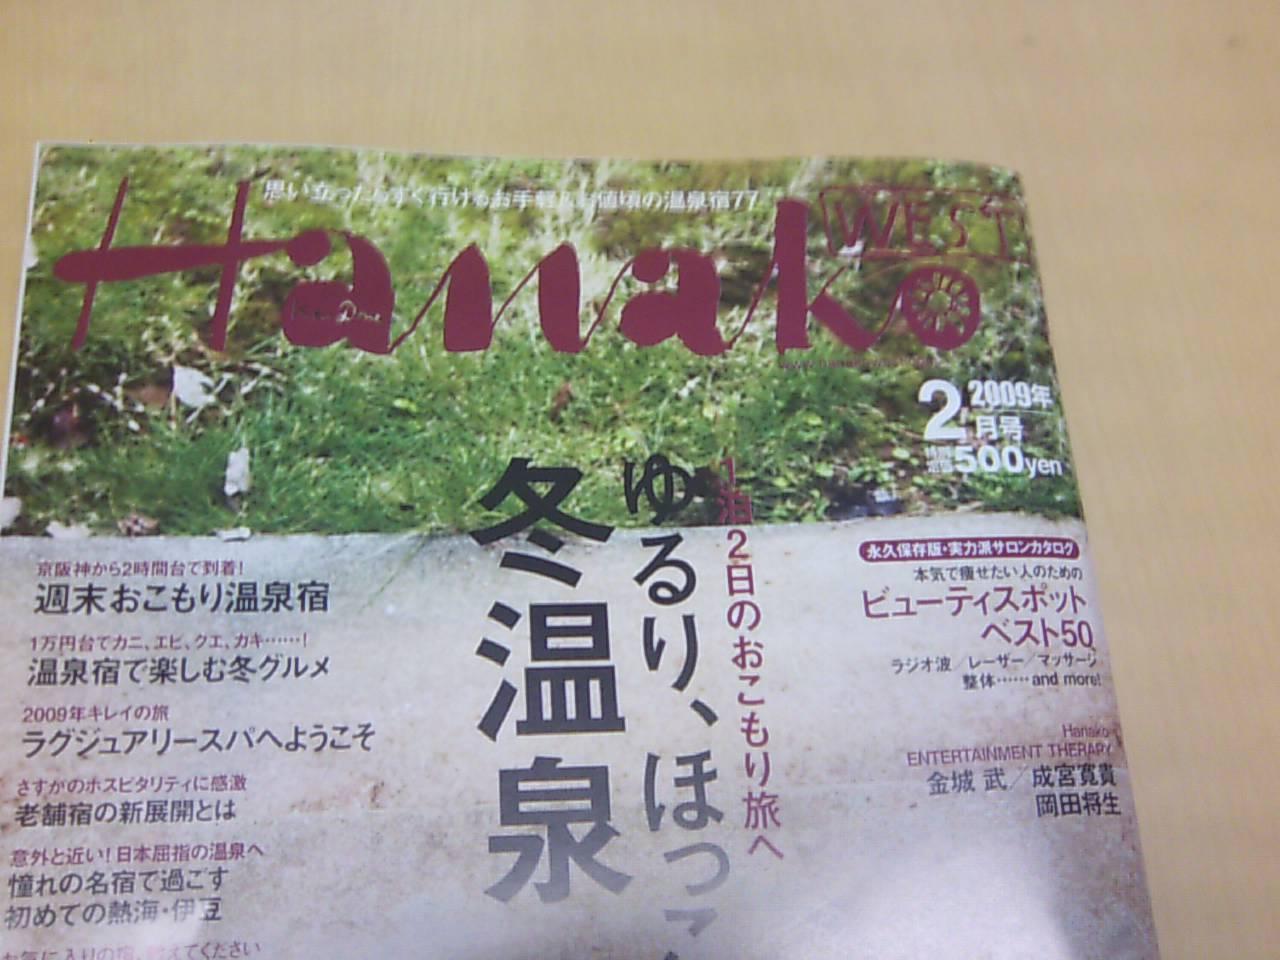 Hanako west セルフアップ風水_c0079826_160880.jpg